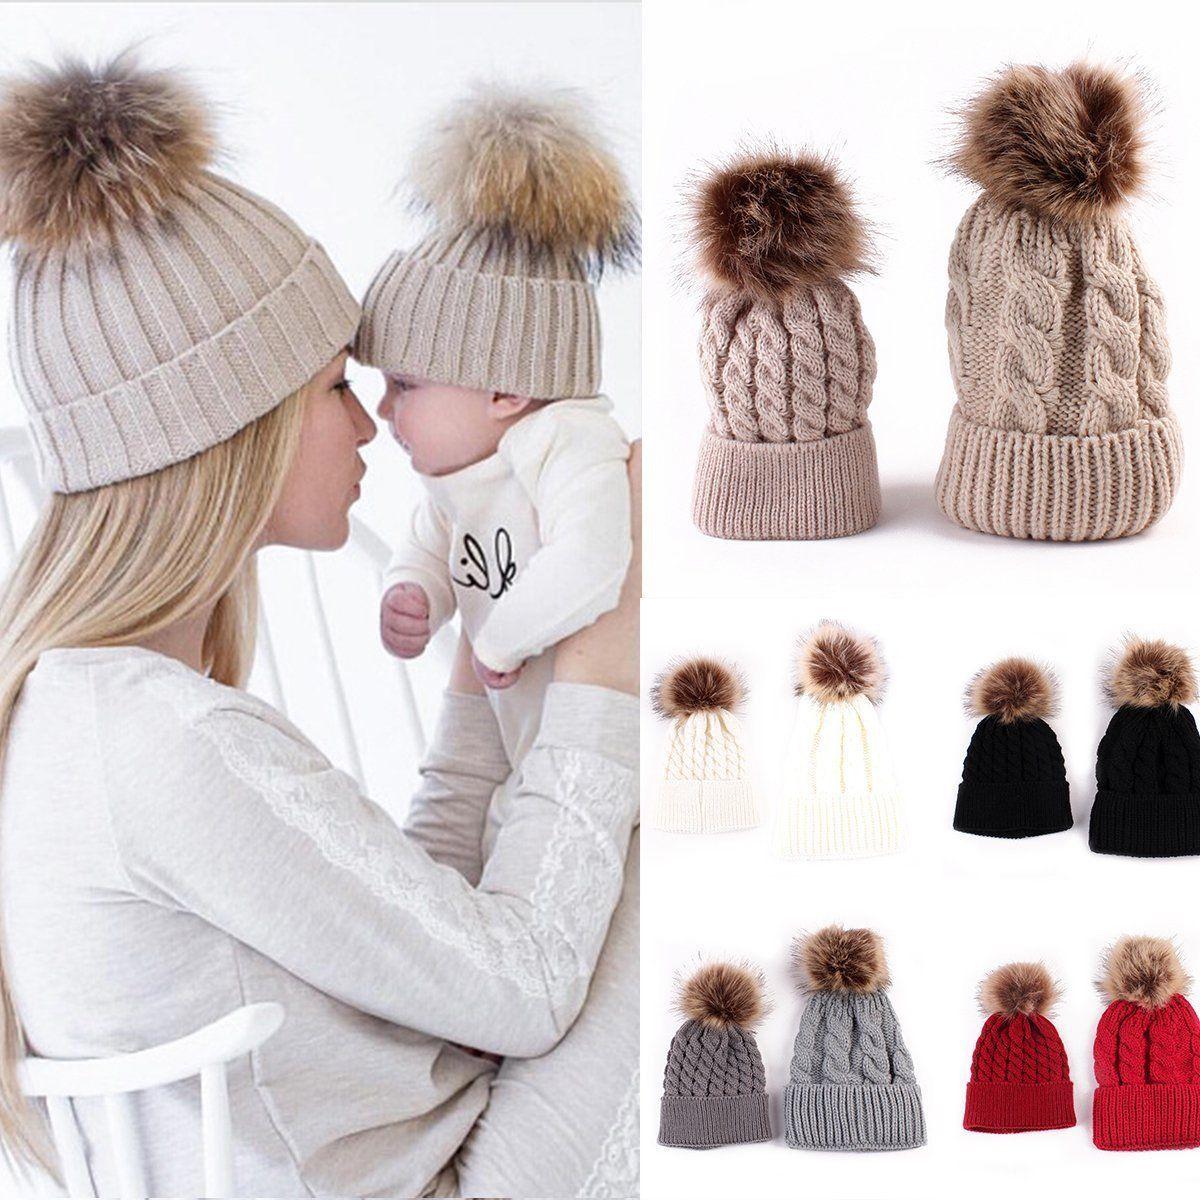 18769e1a5 Mom&born Baby Boys Girls Winter Warm Fur Pom Bobble Knit Beanie Hat ...